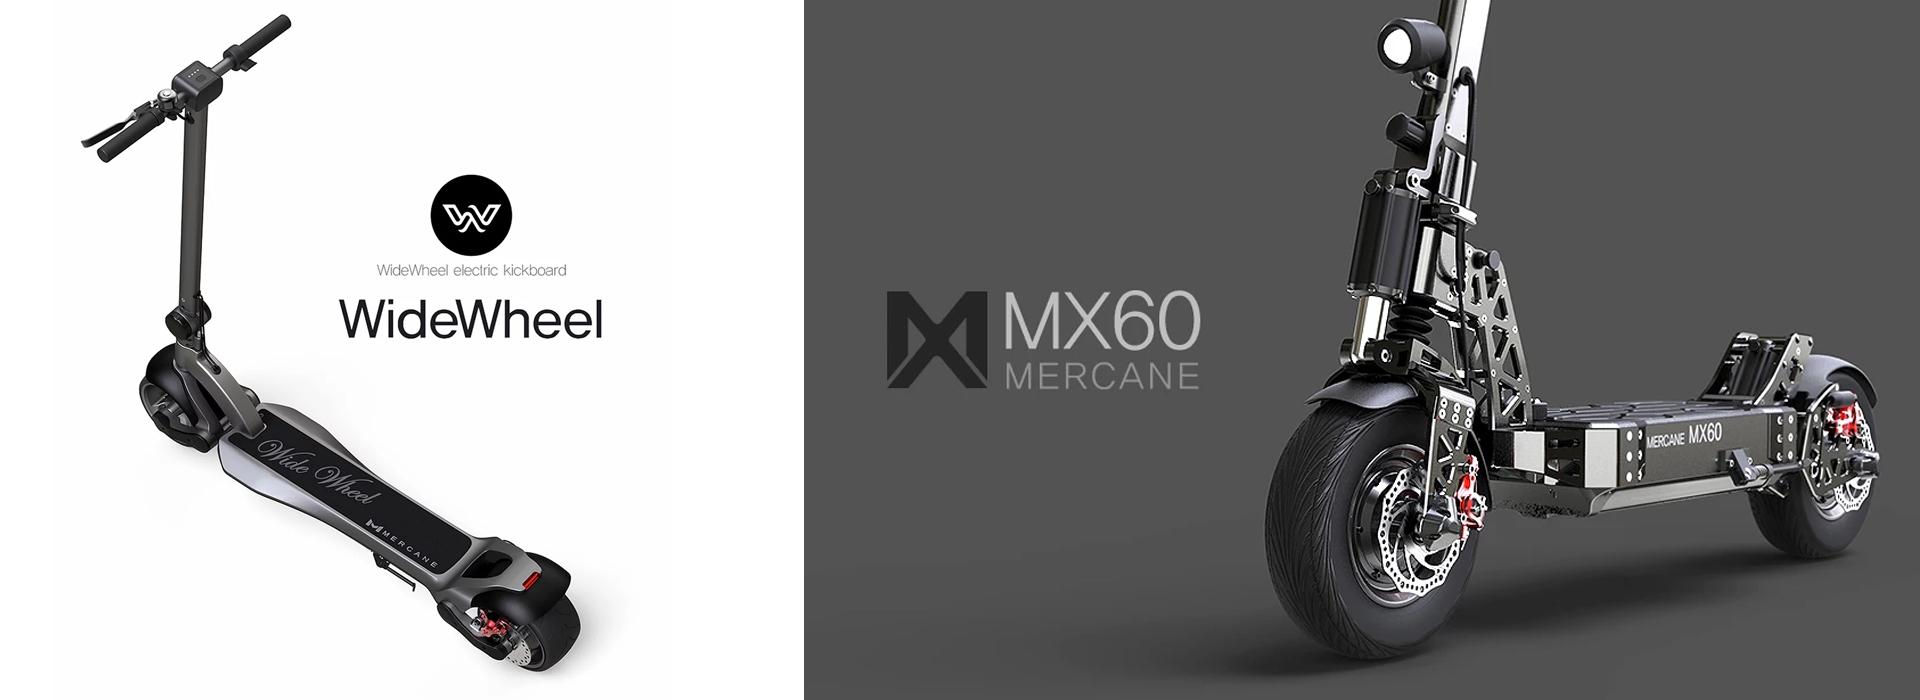 Mercane - E Scooter Range - WideWheel Pro - MX60 - Mi Scooter